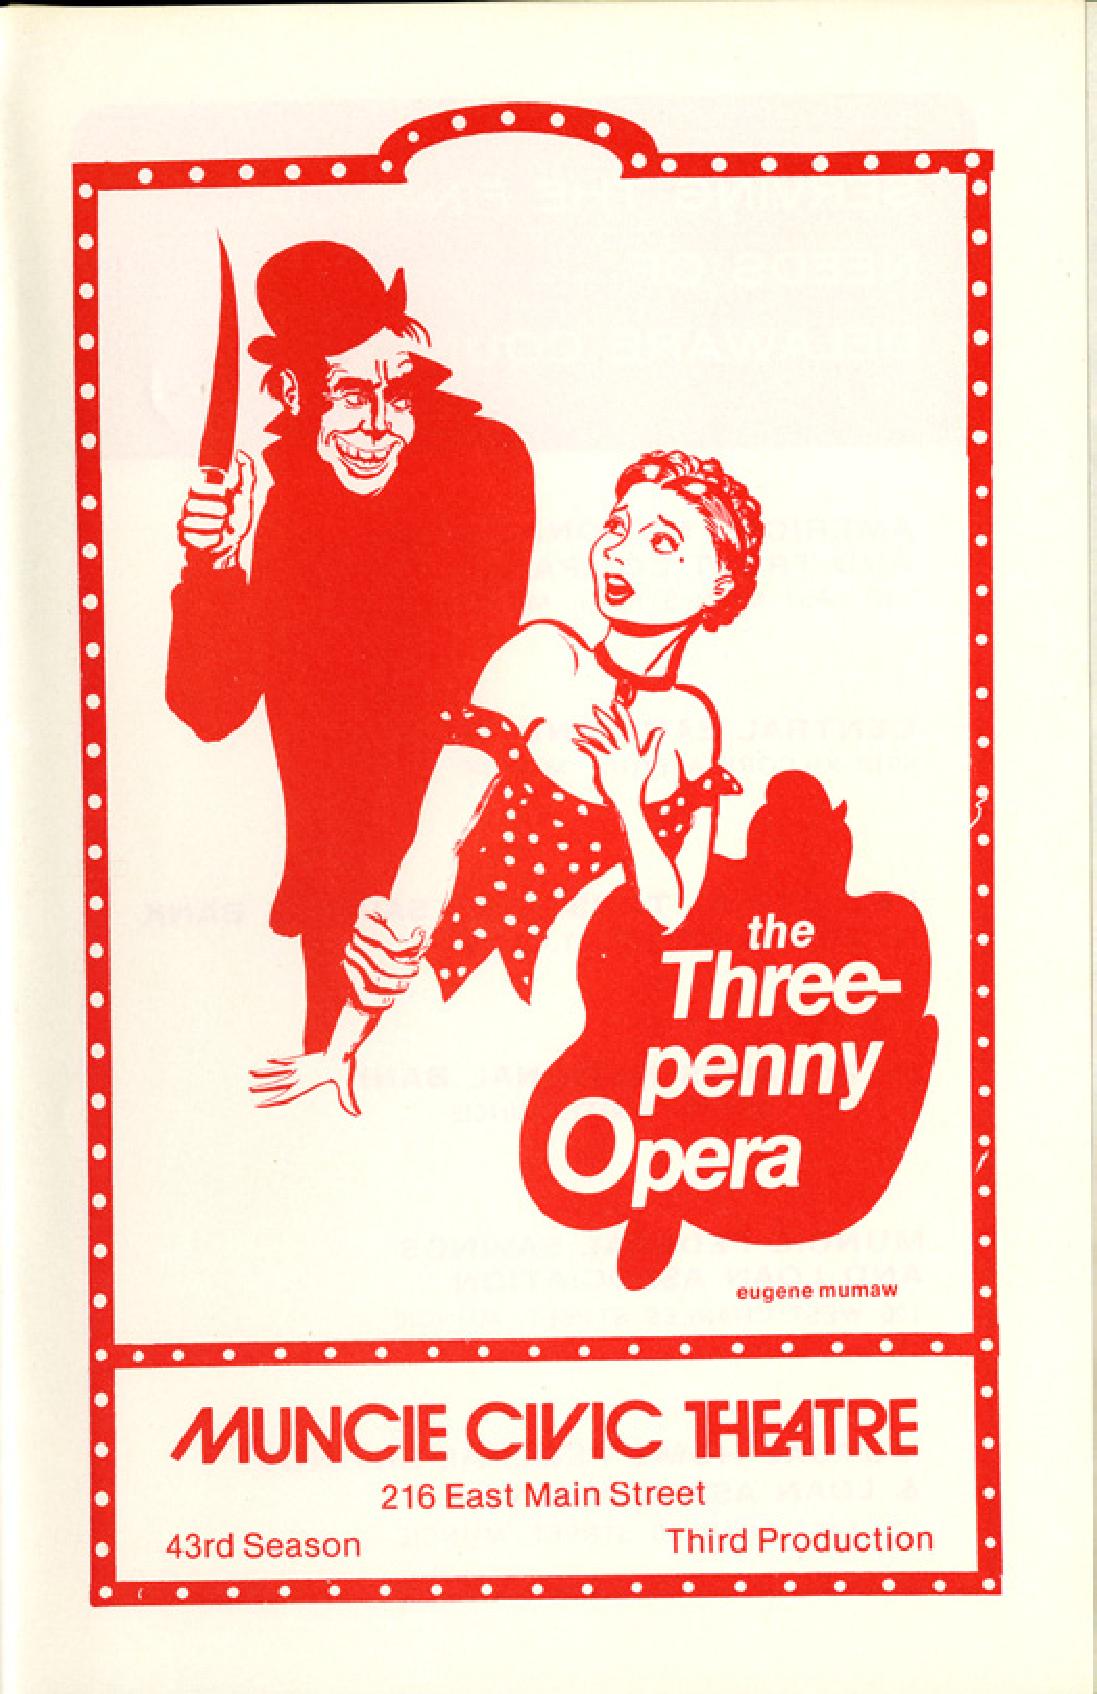 Muncie Civic Theatre program : Threepenny Opera - Muncie